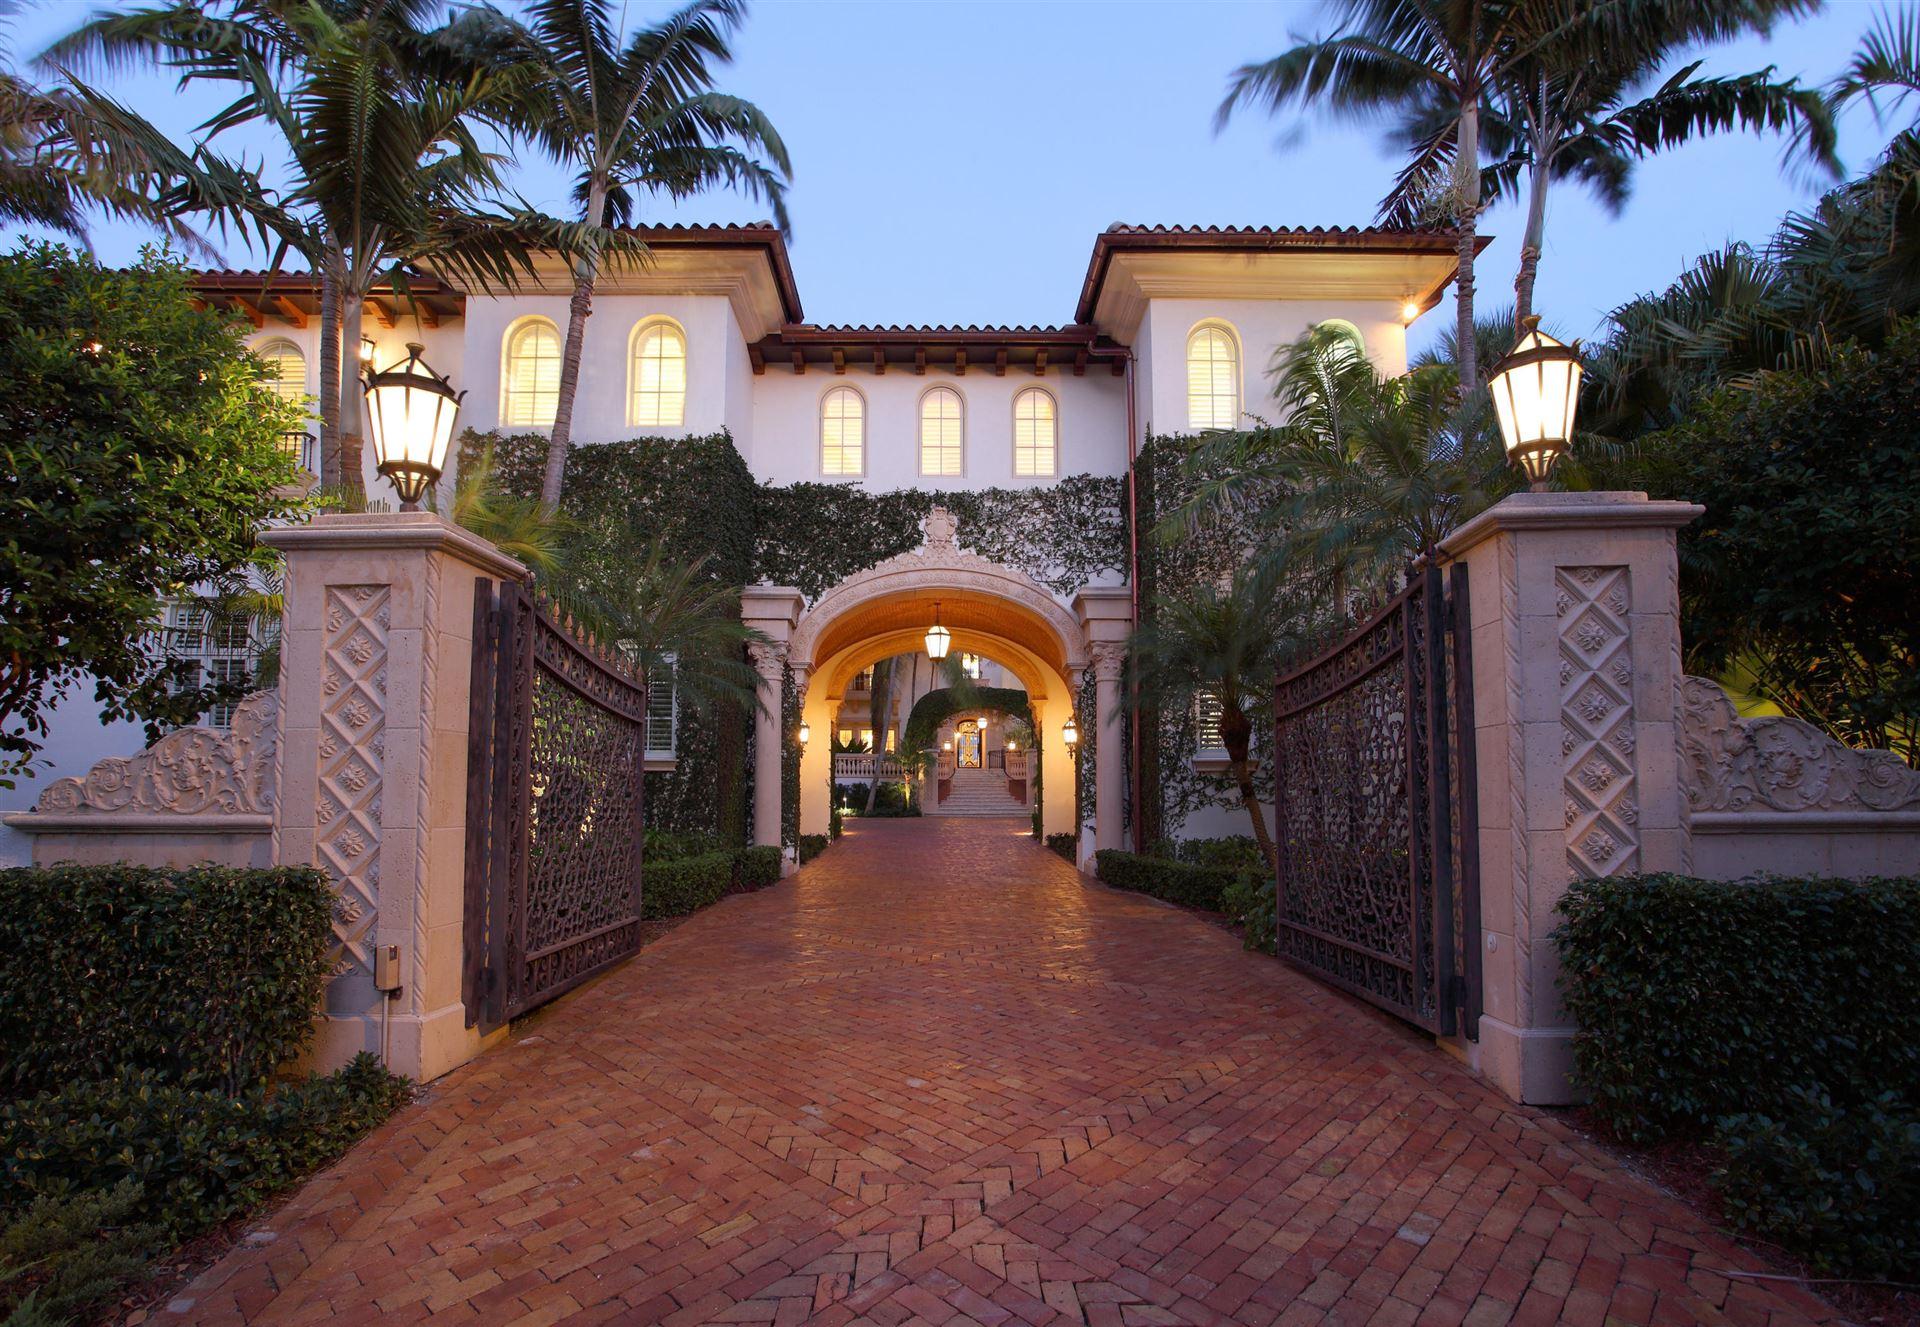 2367 S Ocean Boulevard                                                                               Highland Beach                                                                      , FL - $25,500,000